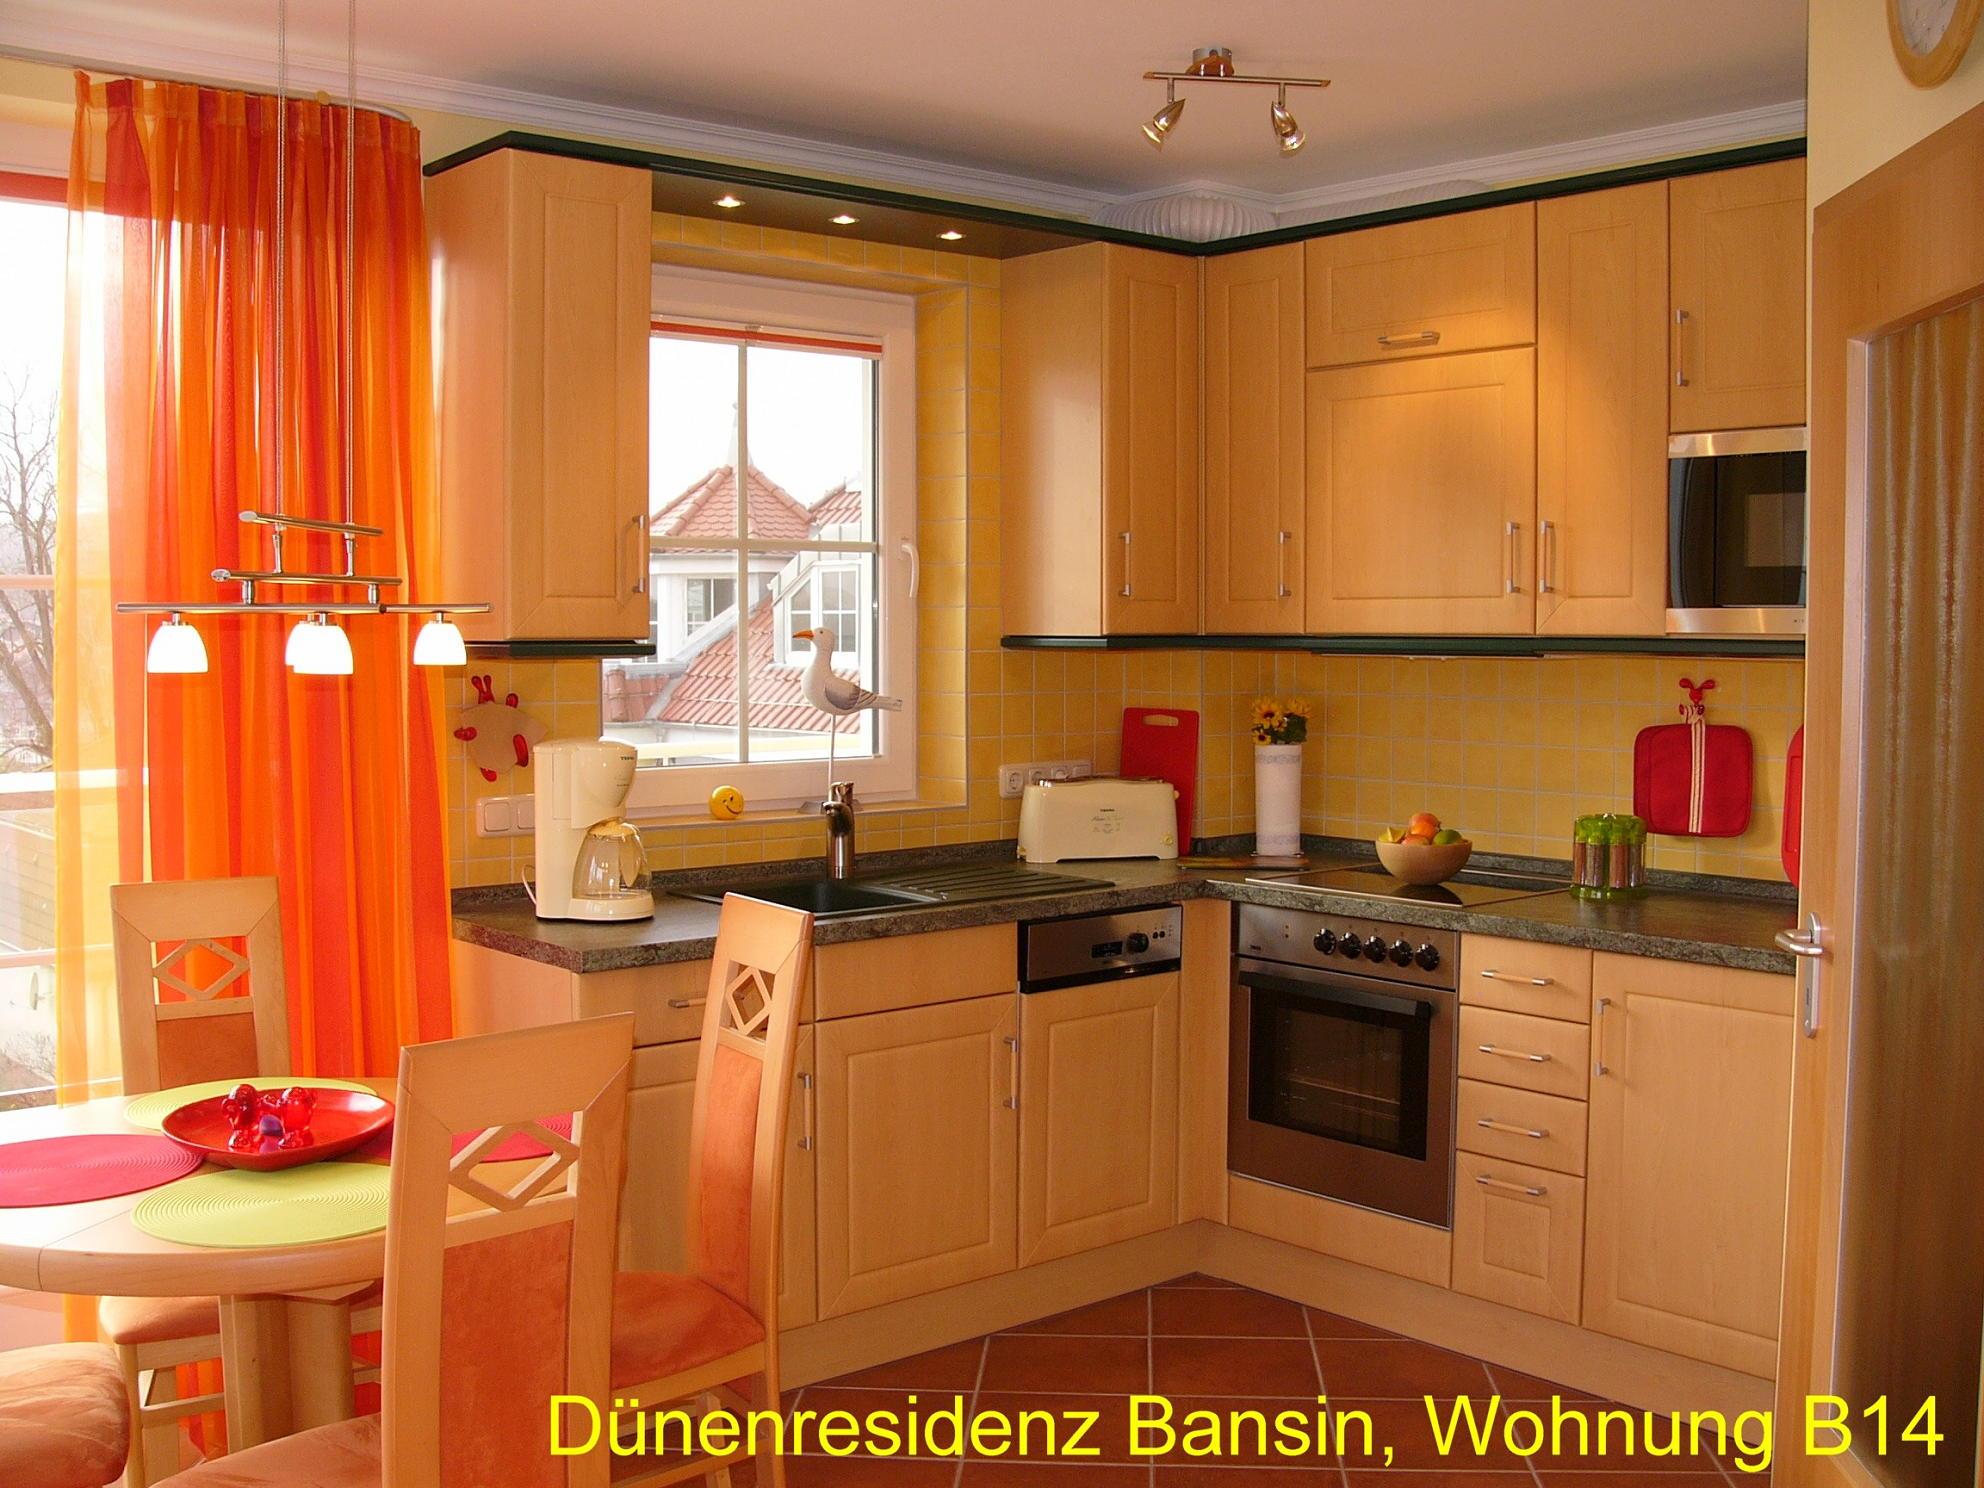 k chenideen k chen abverkauf k chen abverkauf gebraucht k chen amerikanische kueche. Black Bedroom Furniture Sets. Home Design Ideas